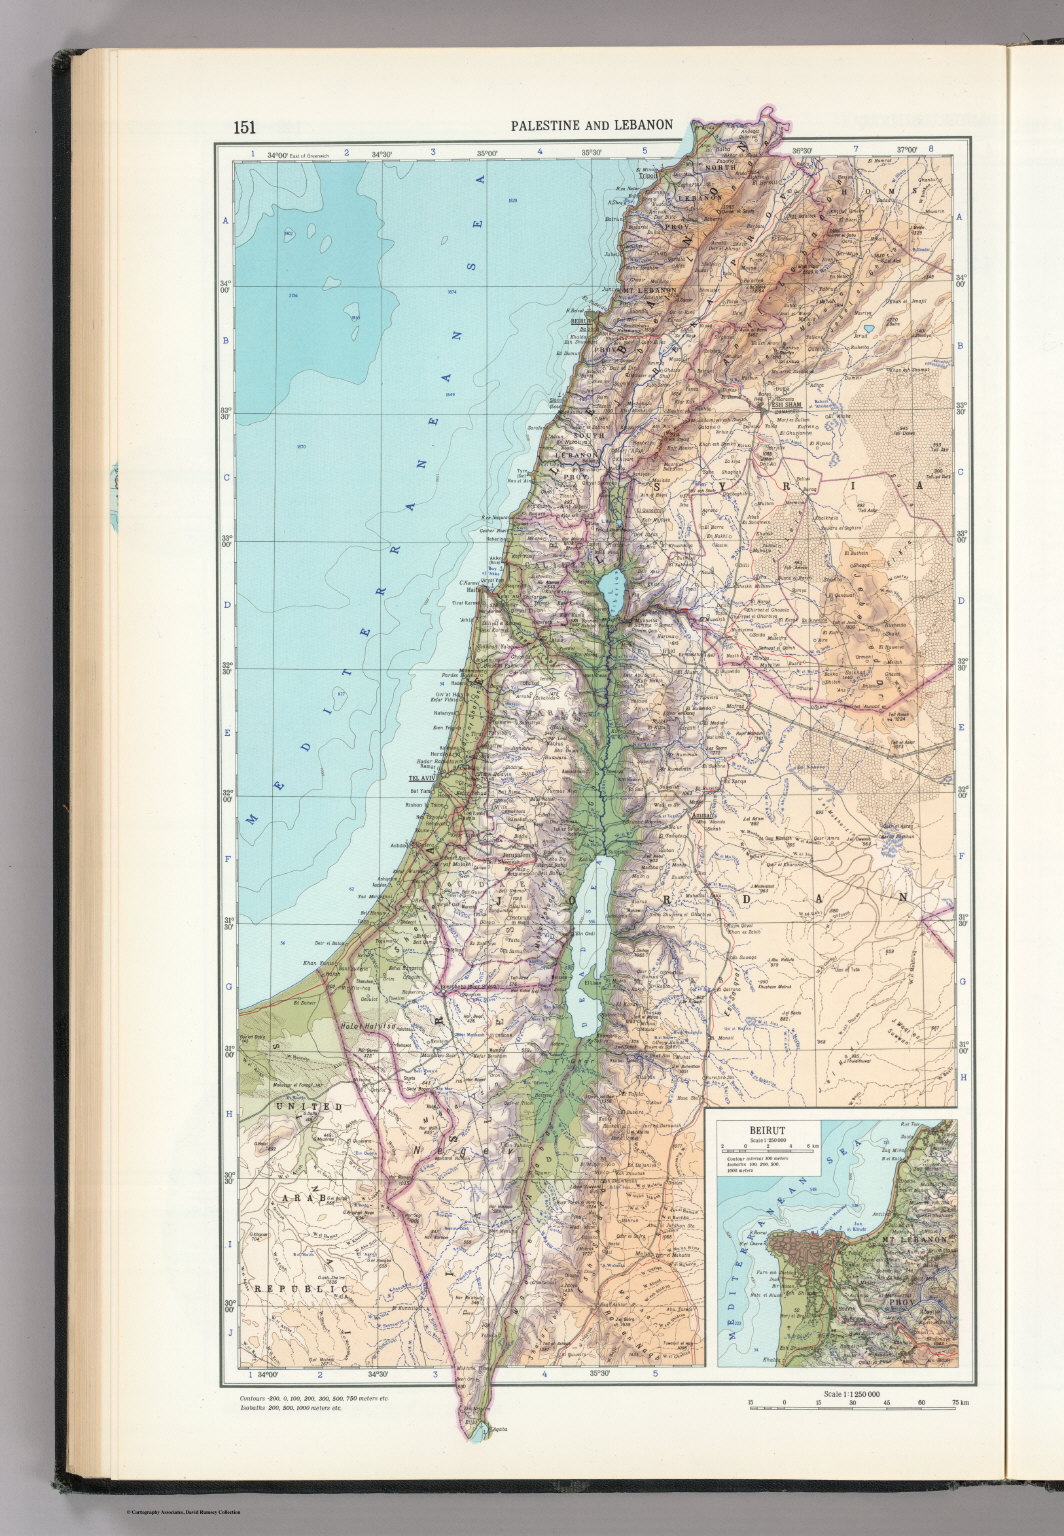 151 palestine and lebanon the world atlas david rumsey palestine and lebanon the world atlas gumiabroncs Images